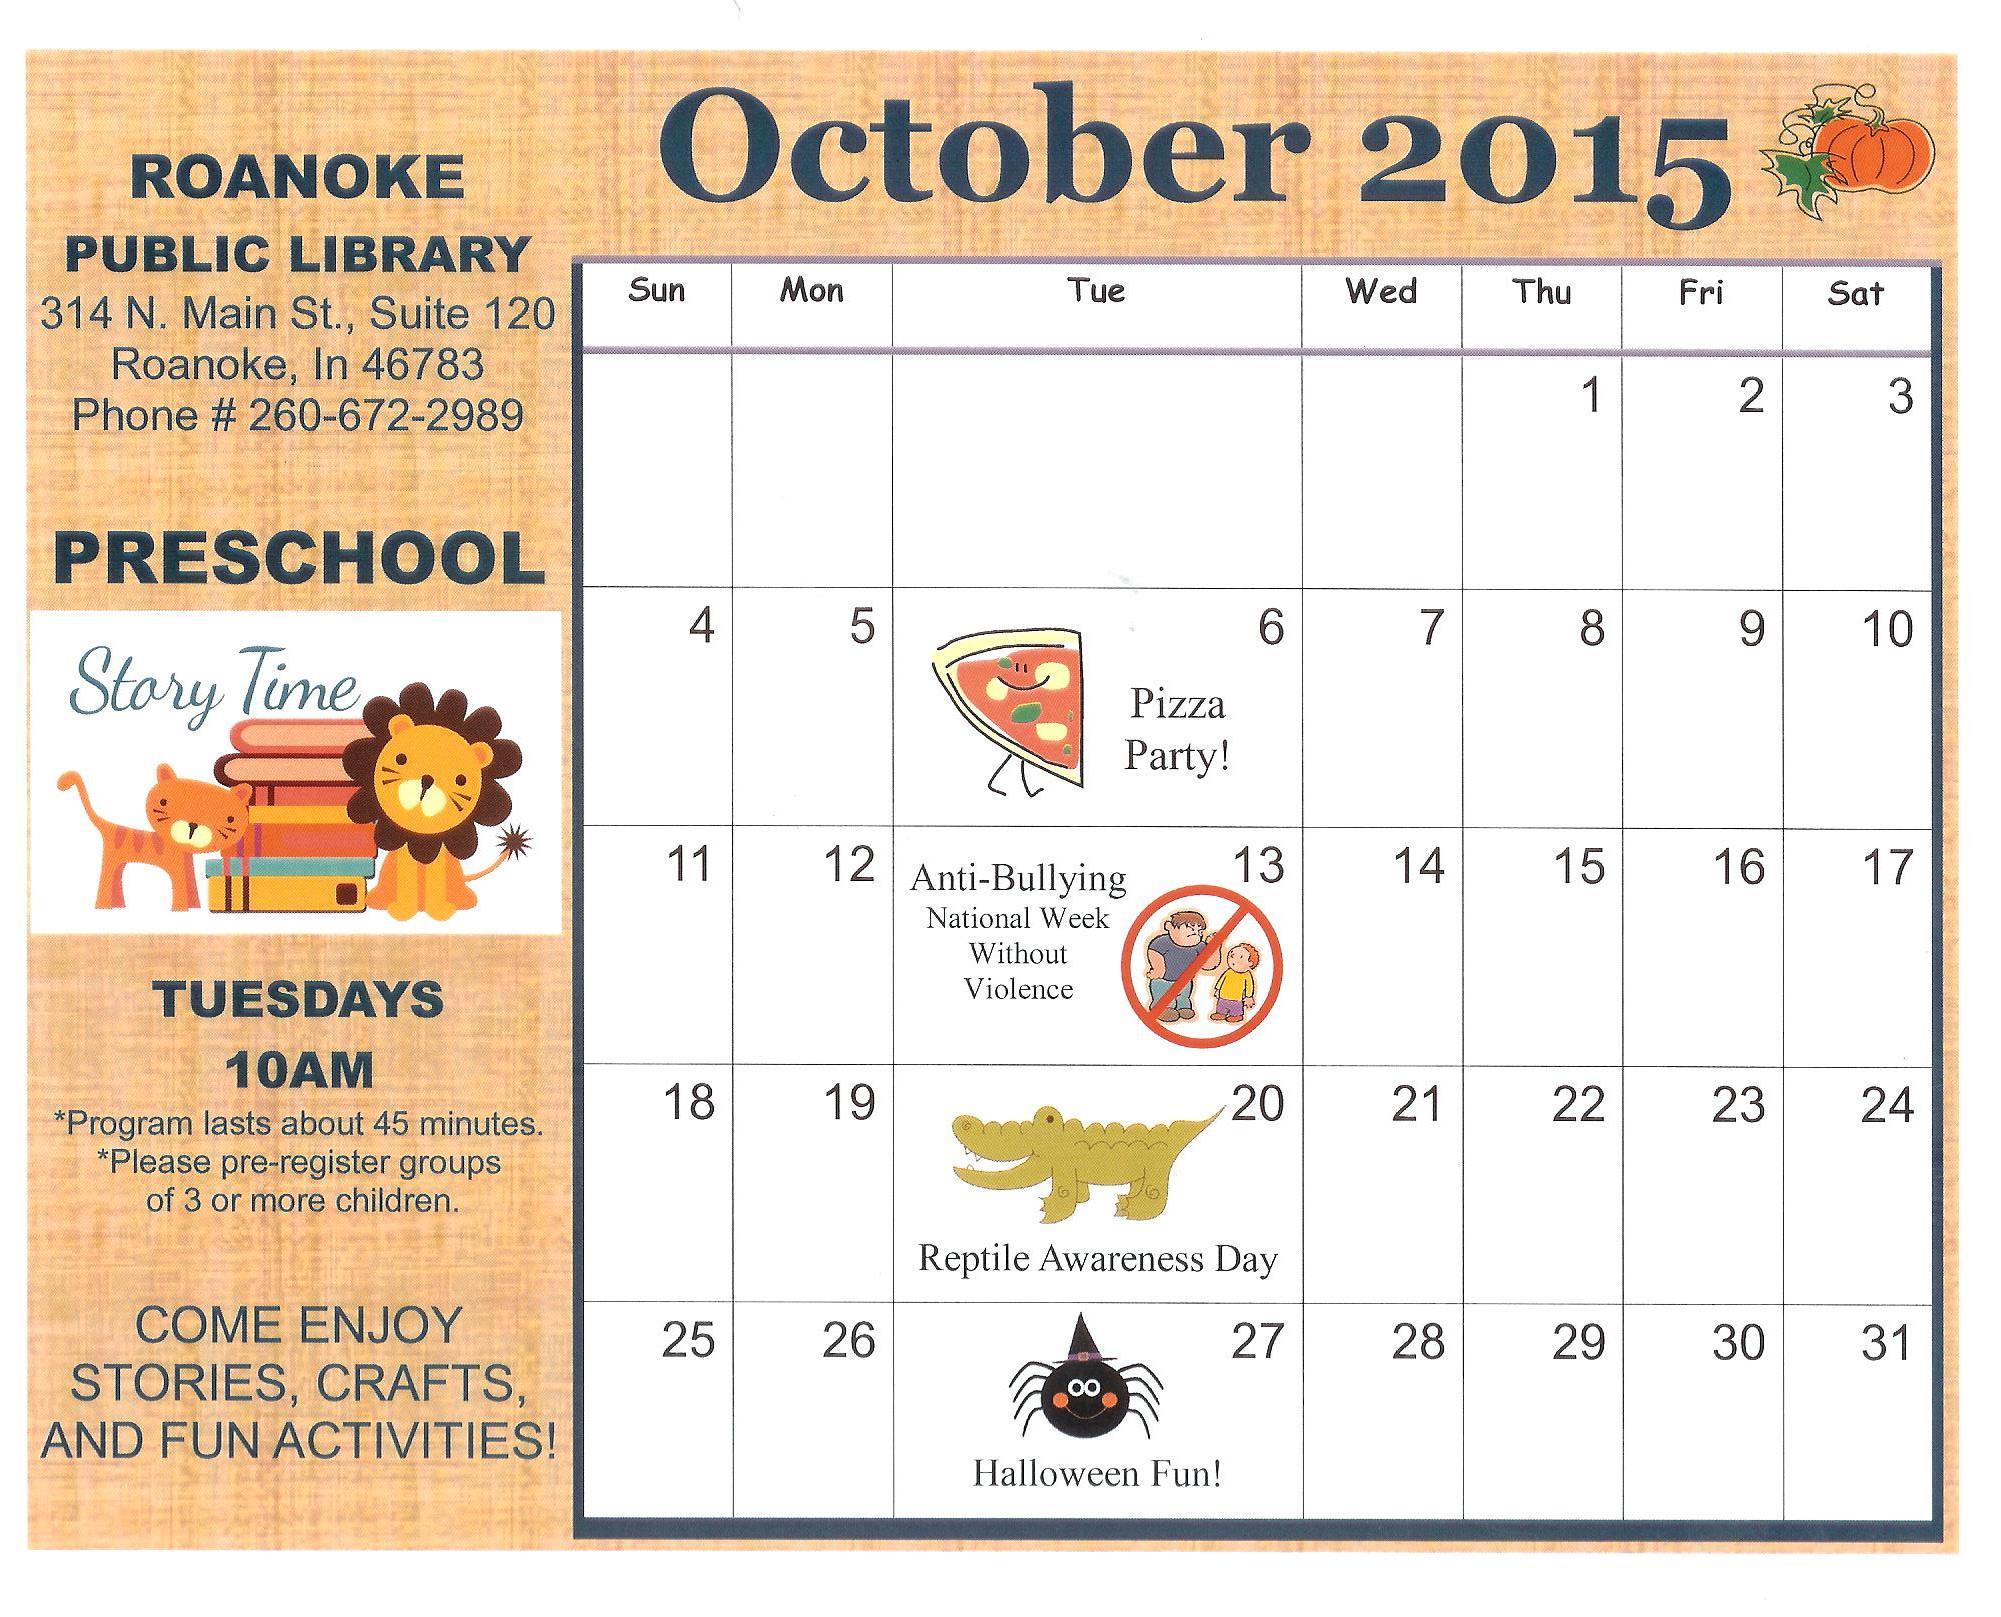 October Calendar Ideas For Preschool : Preschool story time october children with student cards